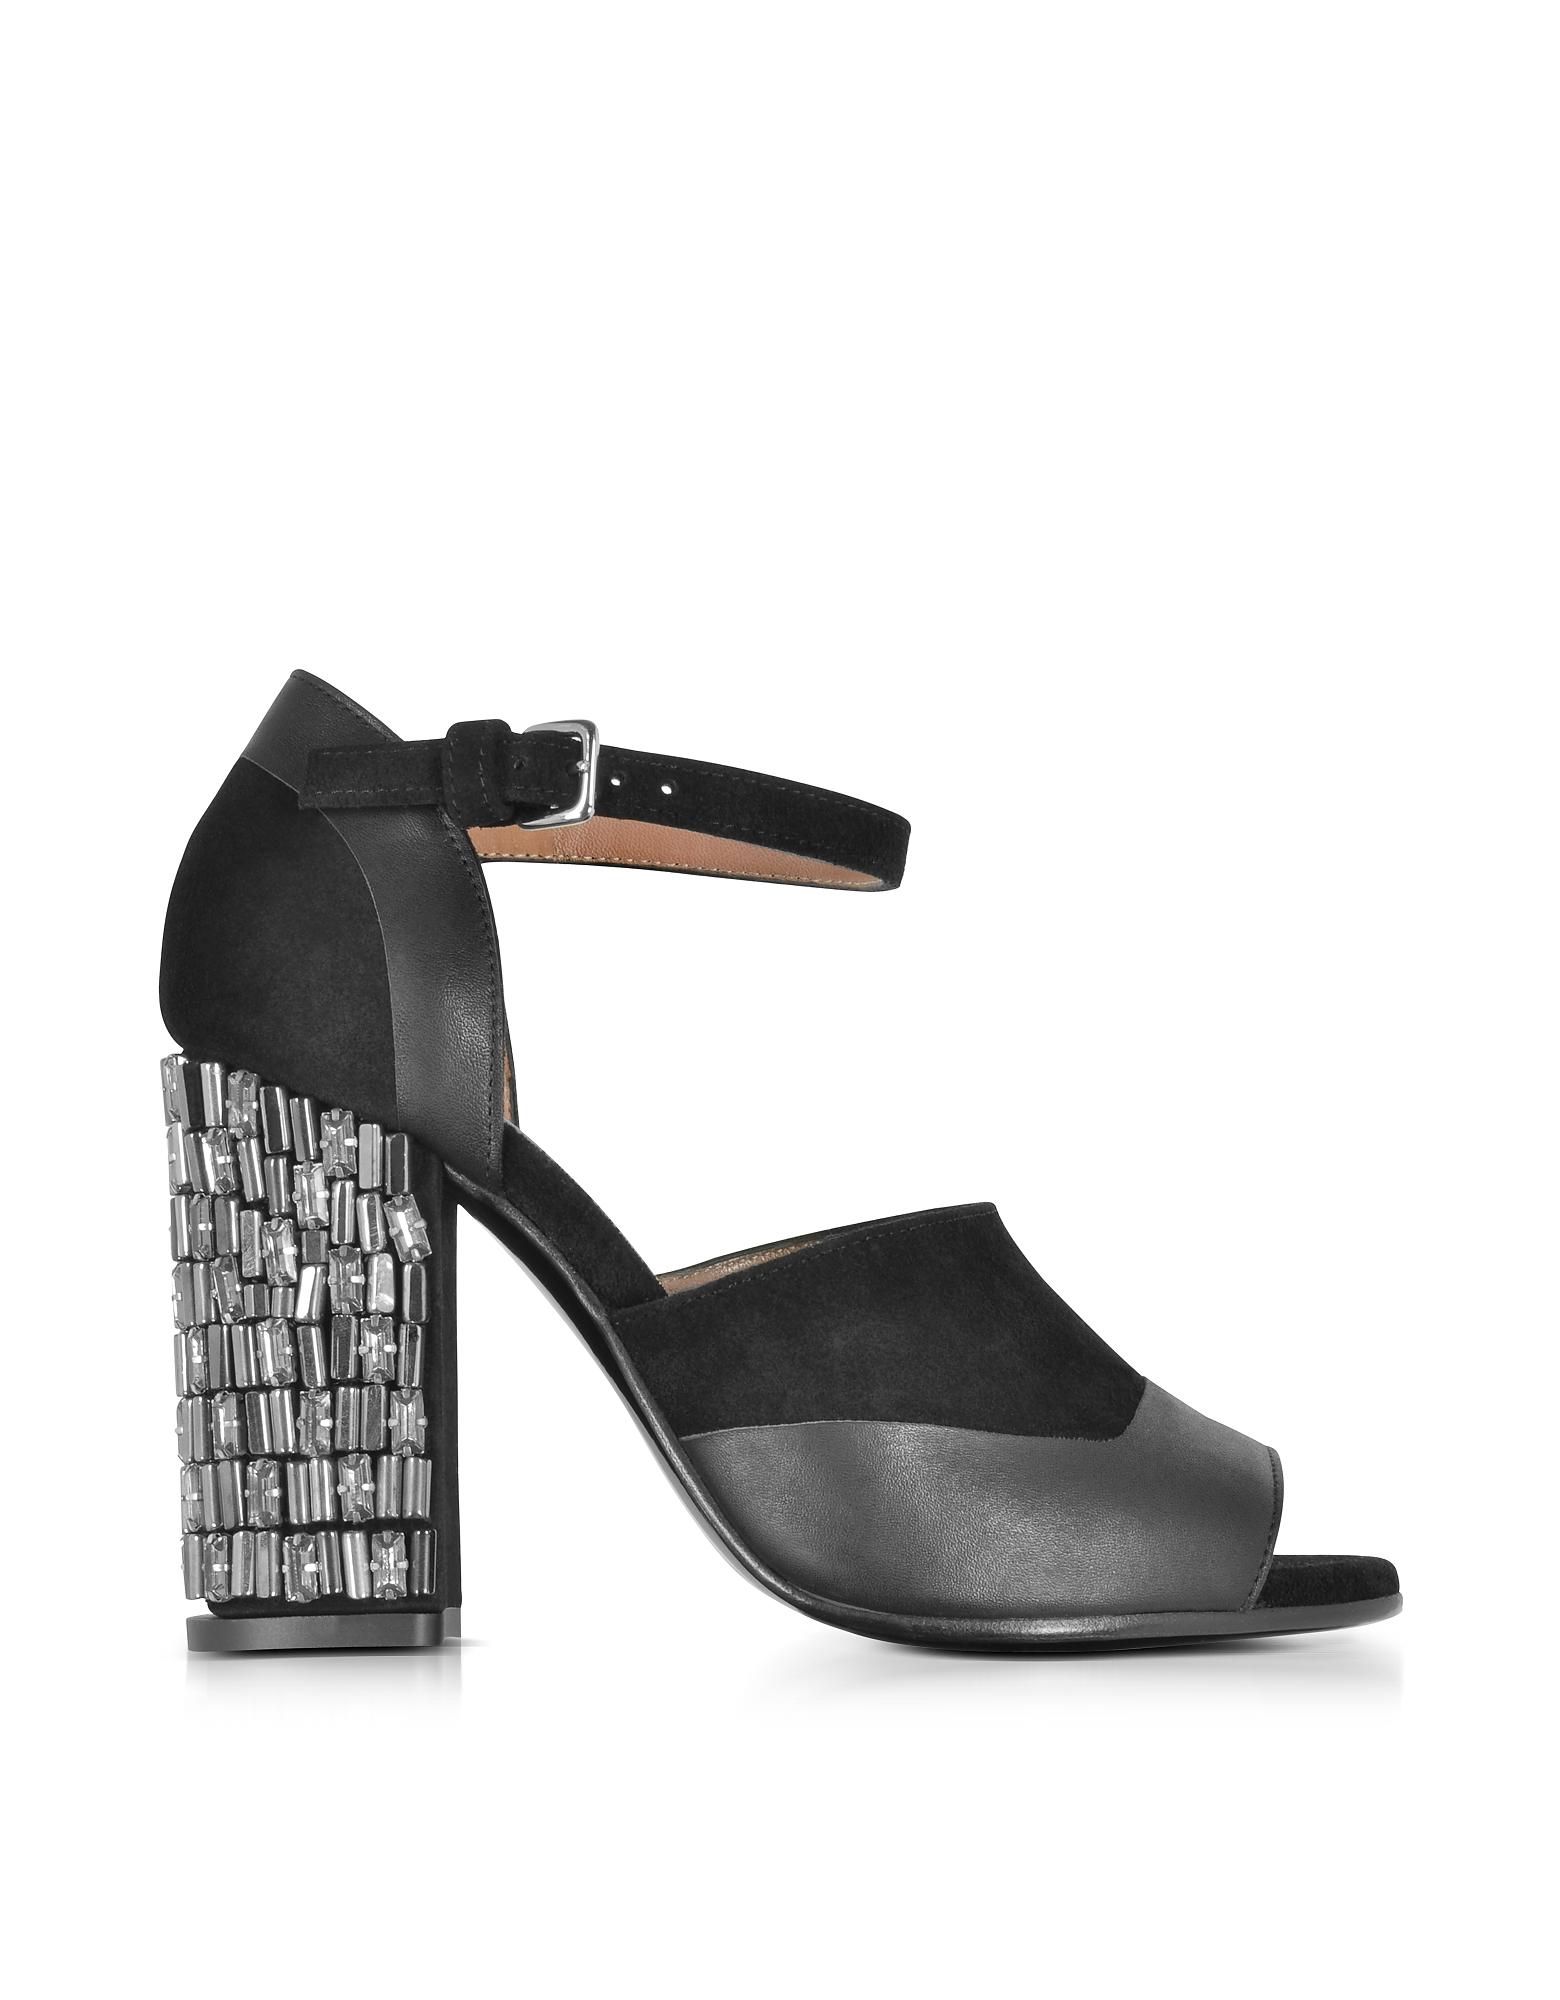 Marni Shoes, Black Velvet and Leather Heel Sandal w/Crystals